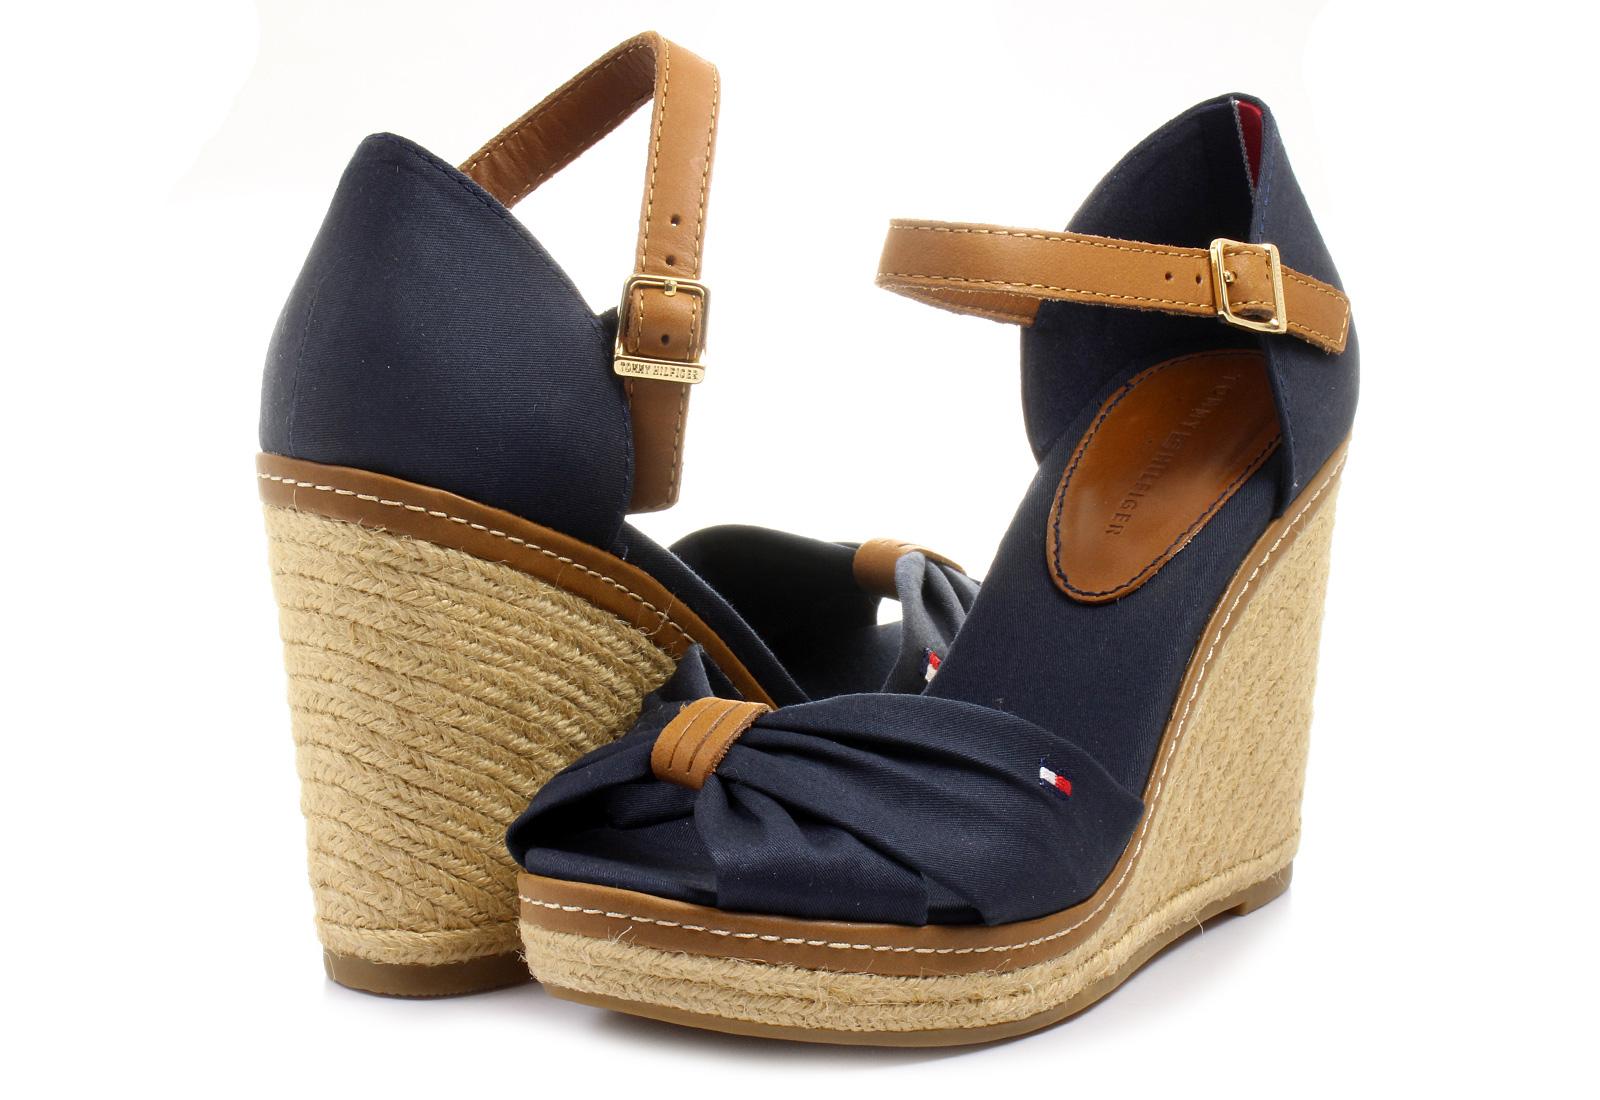 c1096940f4d7 Tommy Hilfiger Sandals - Emery 54d - 15S-8540-403 - Online shop for ...